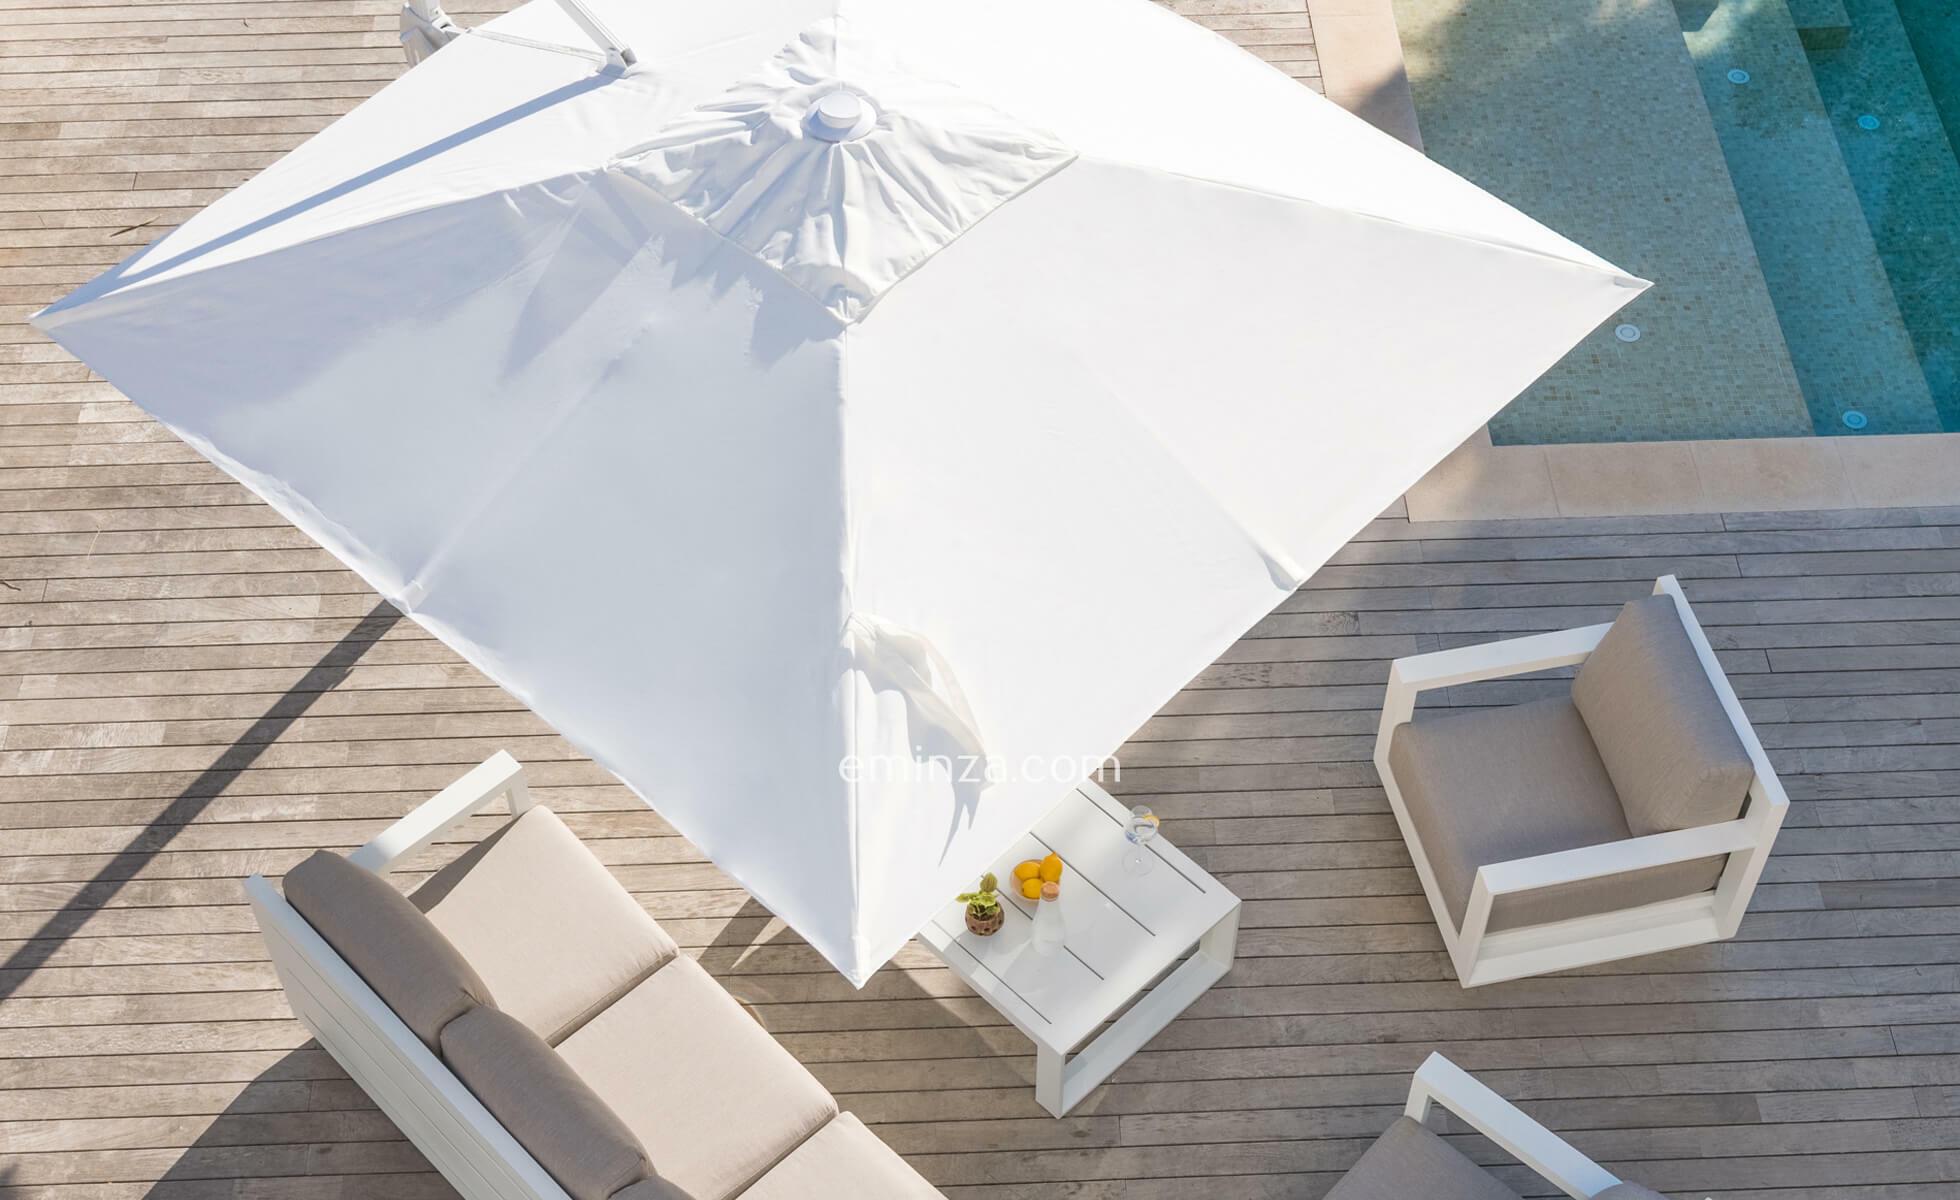 parasol de brazo lateral giratorio blanco